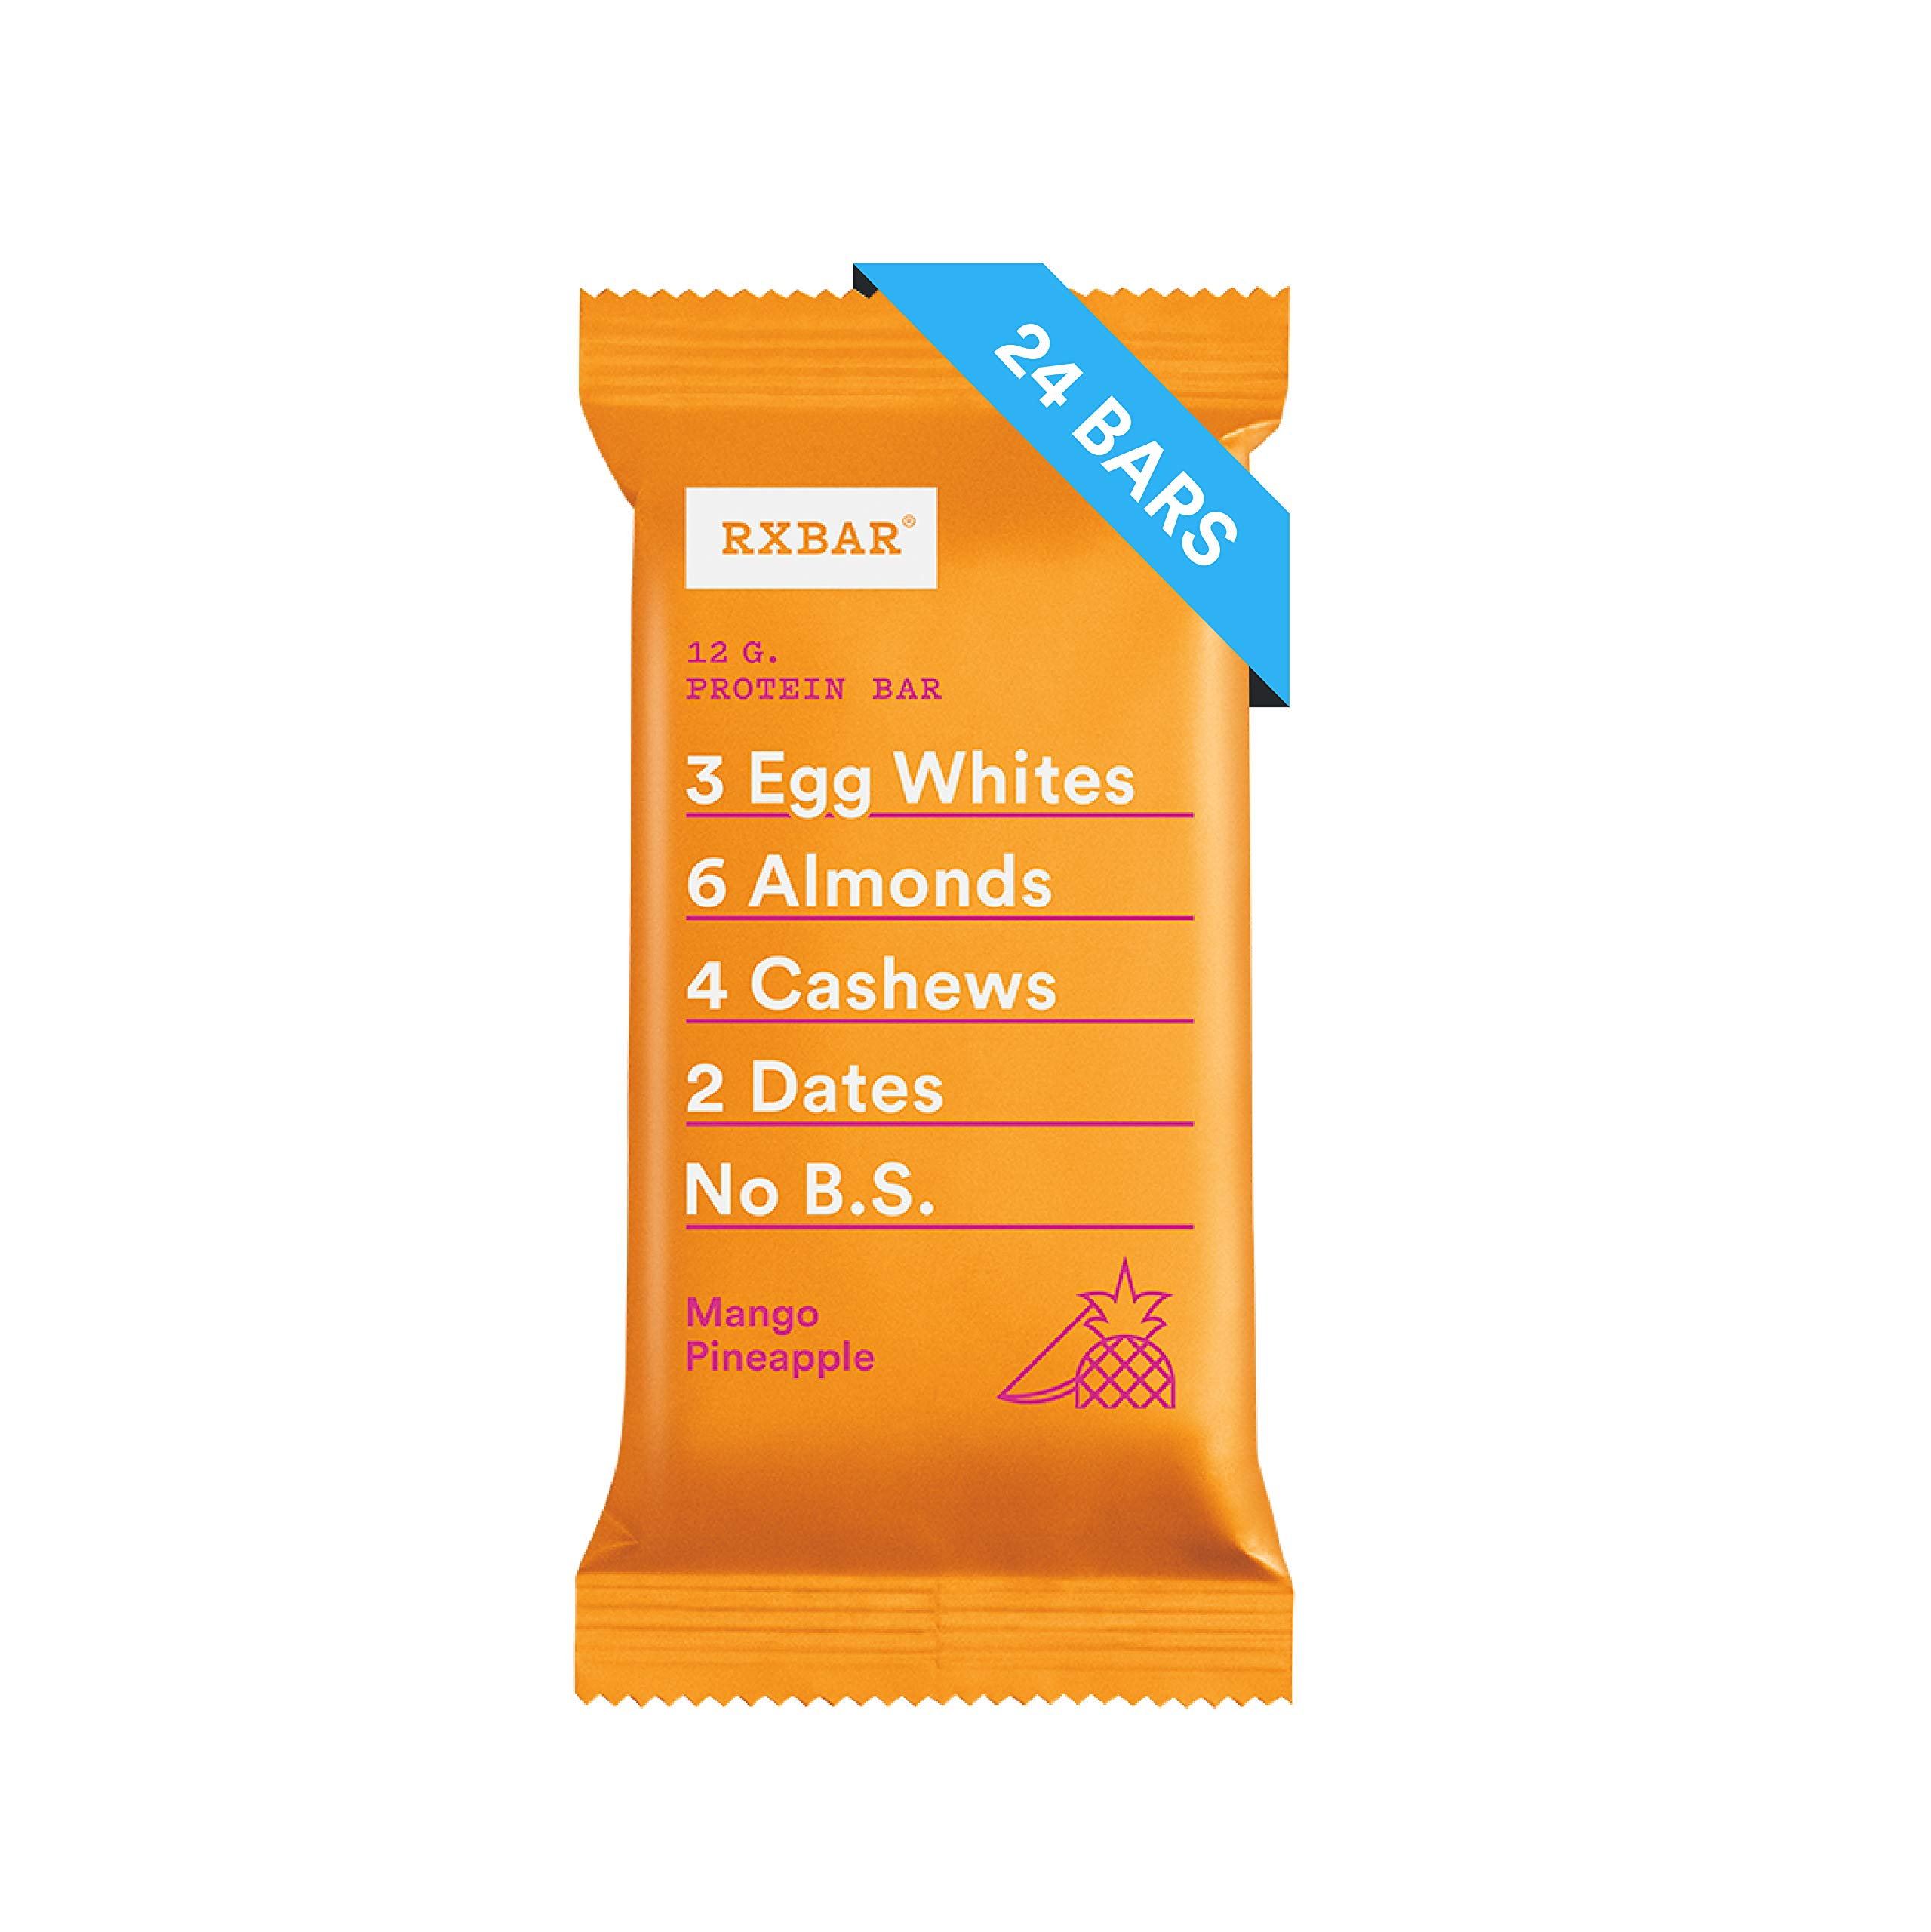 RXBAR Real Food Protein Bar, Mango Pineapple, Gluten Free, 1.83oz Bars, 24 Count